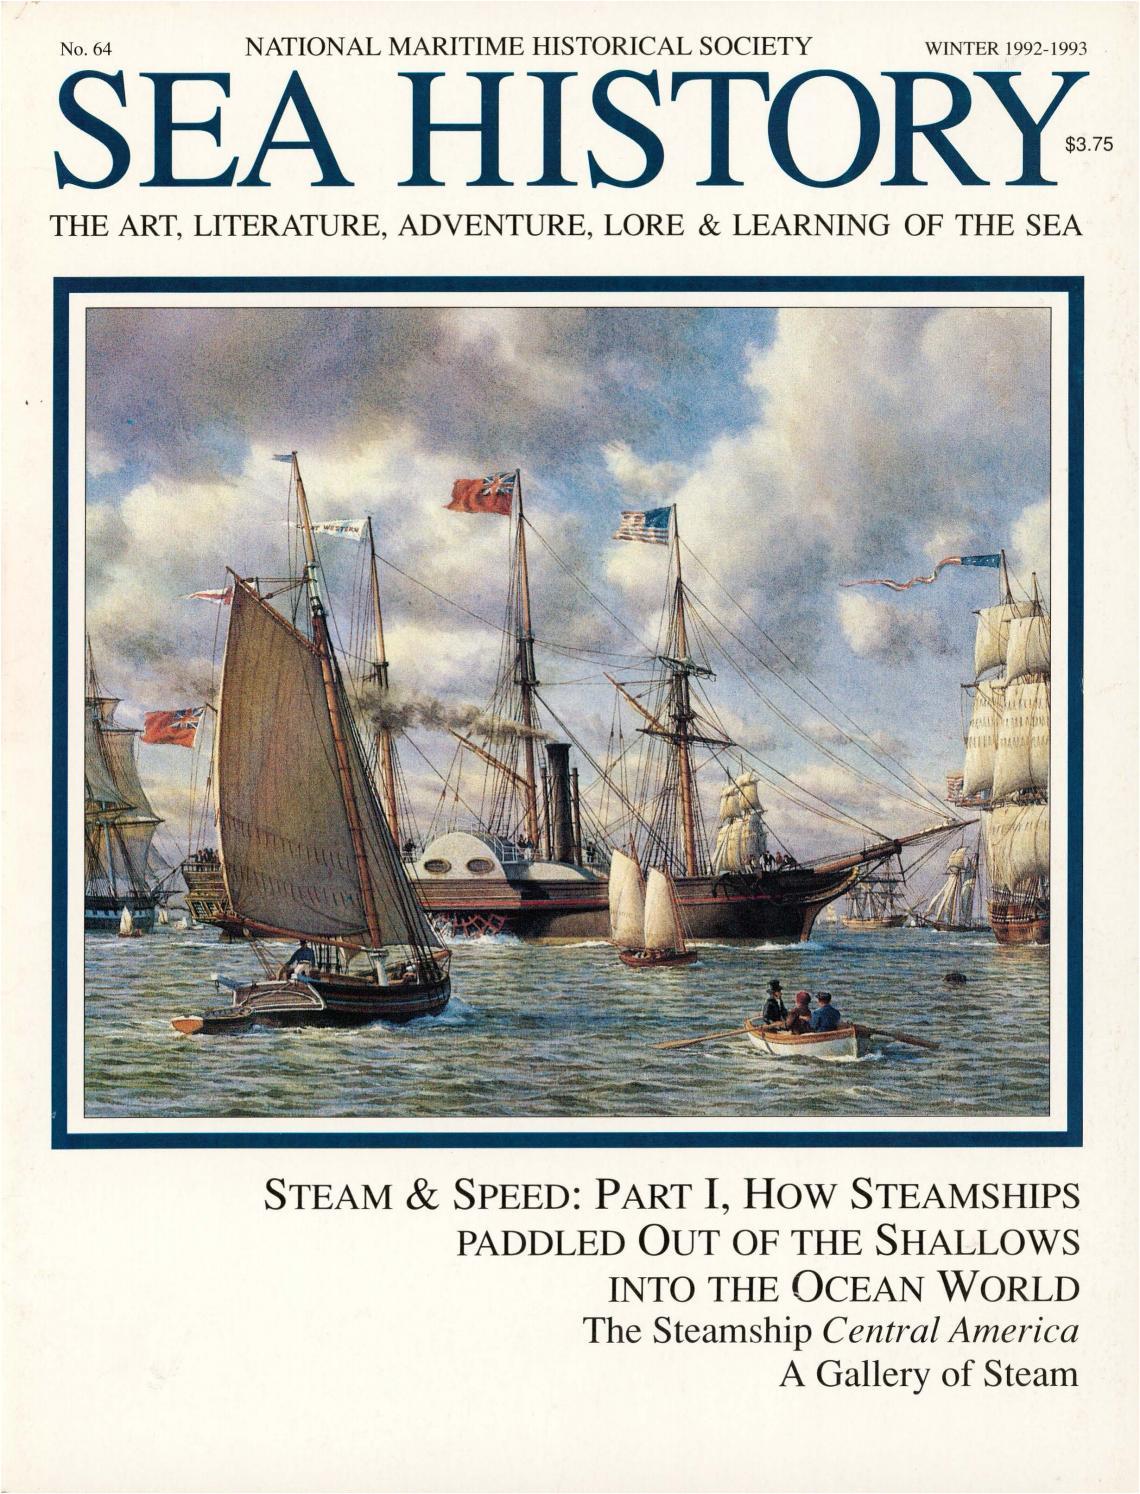 sea history 064 winter 1992 1993 by national maritime historical society sea history magazine issuu